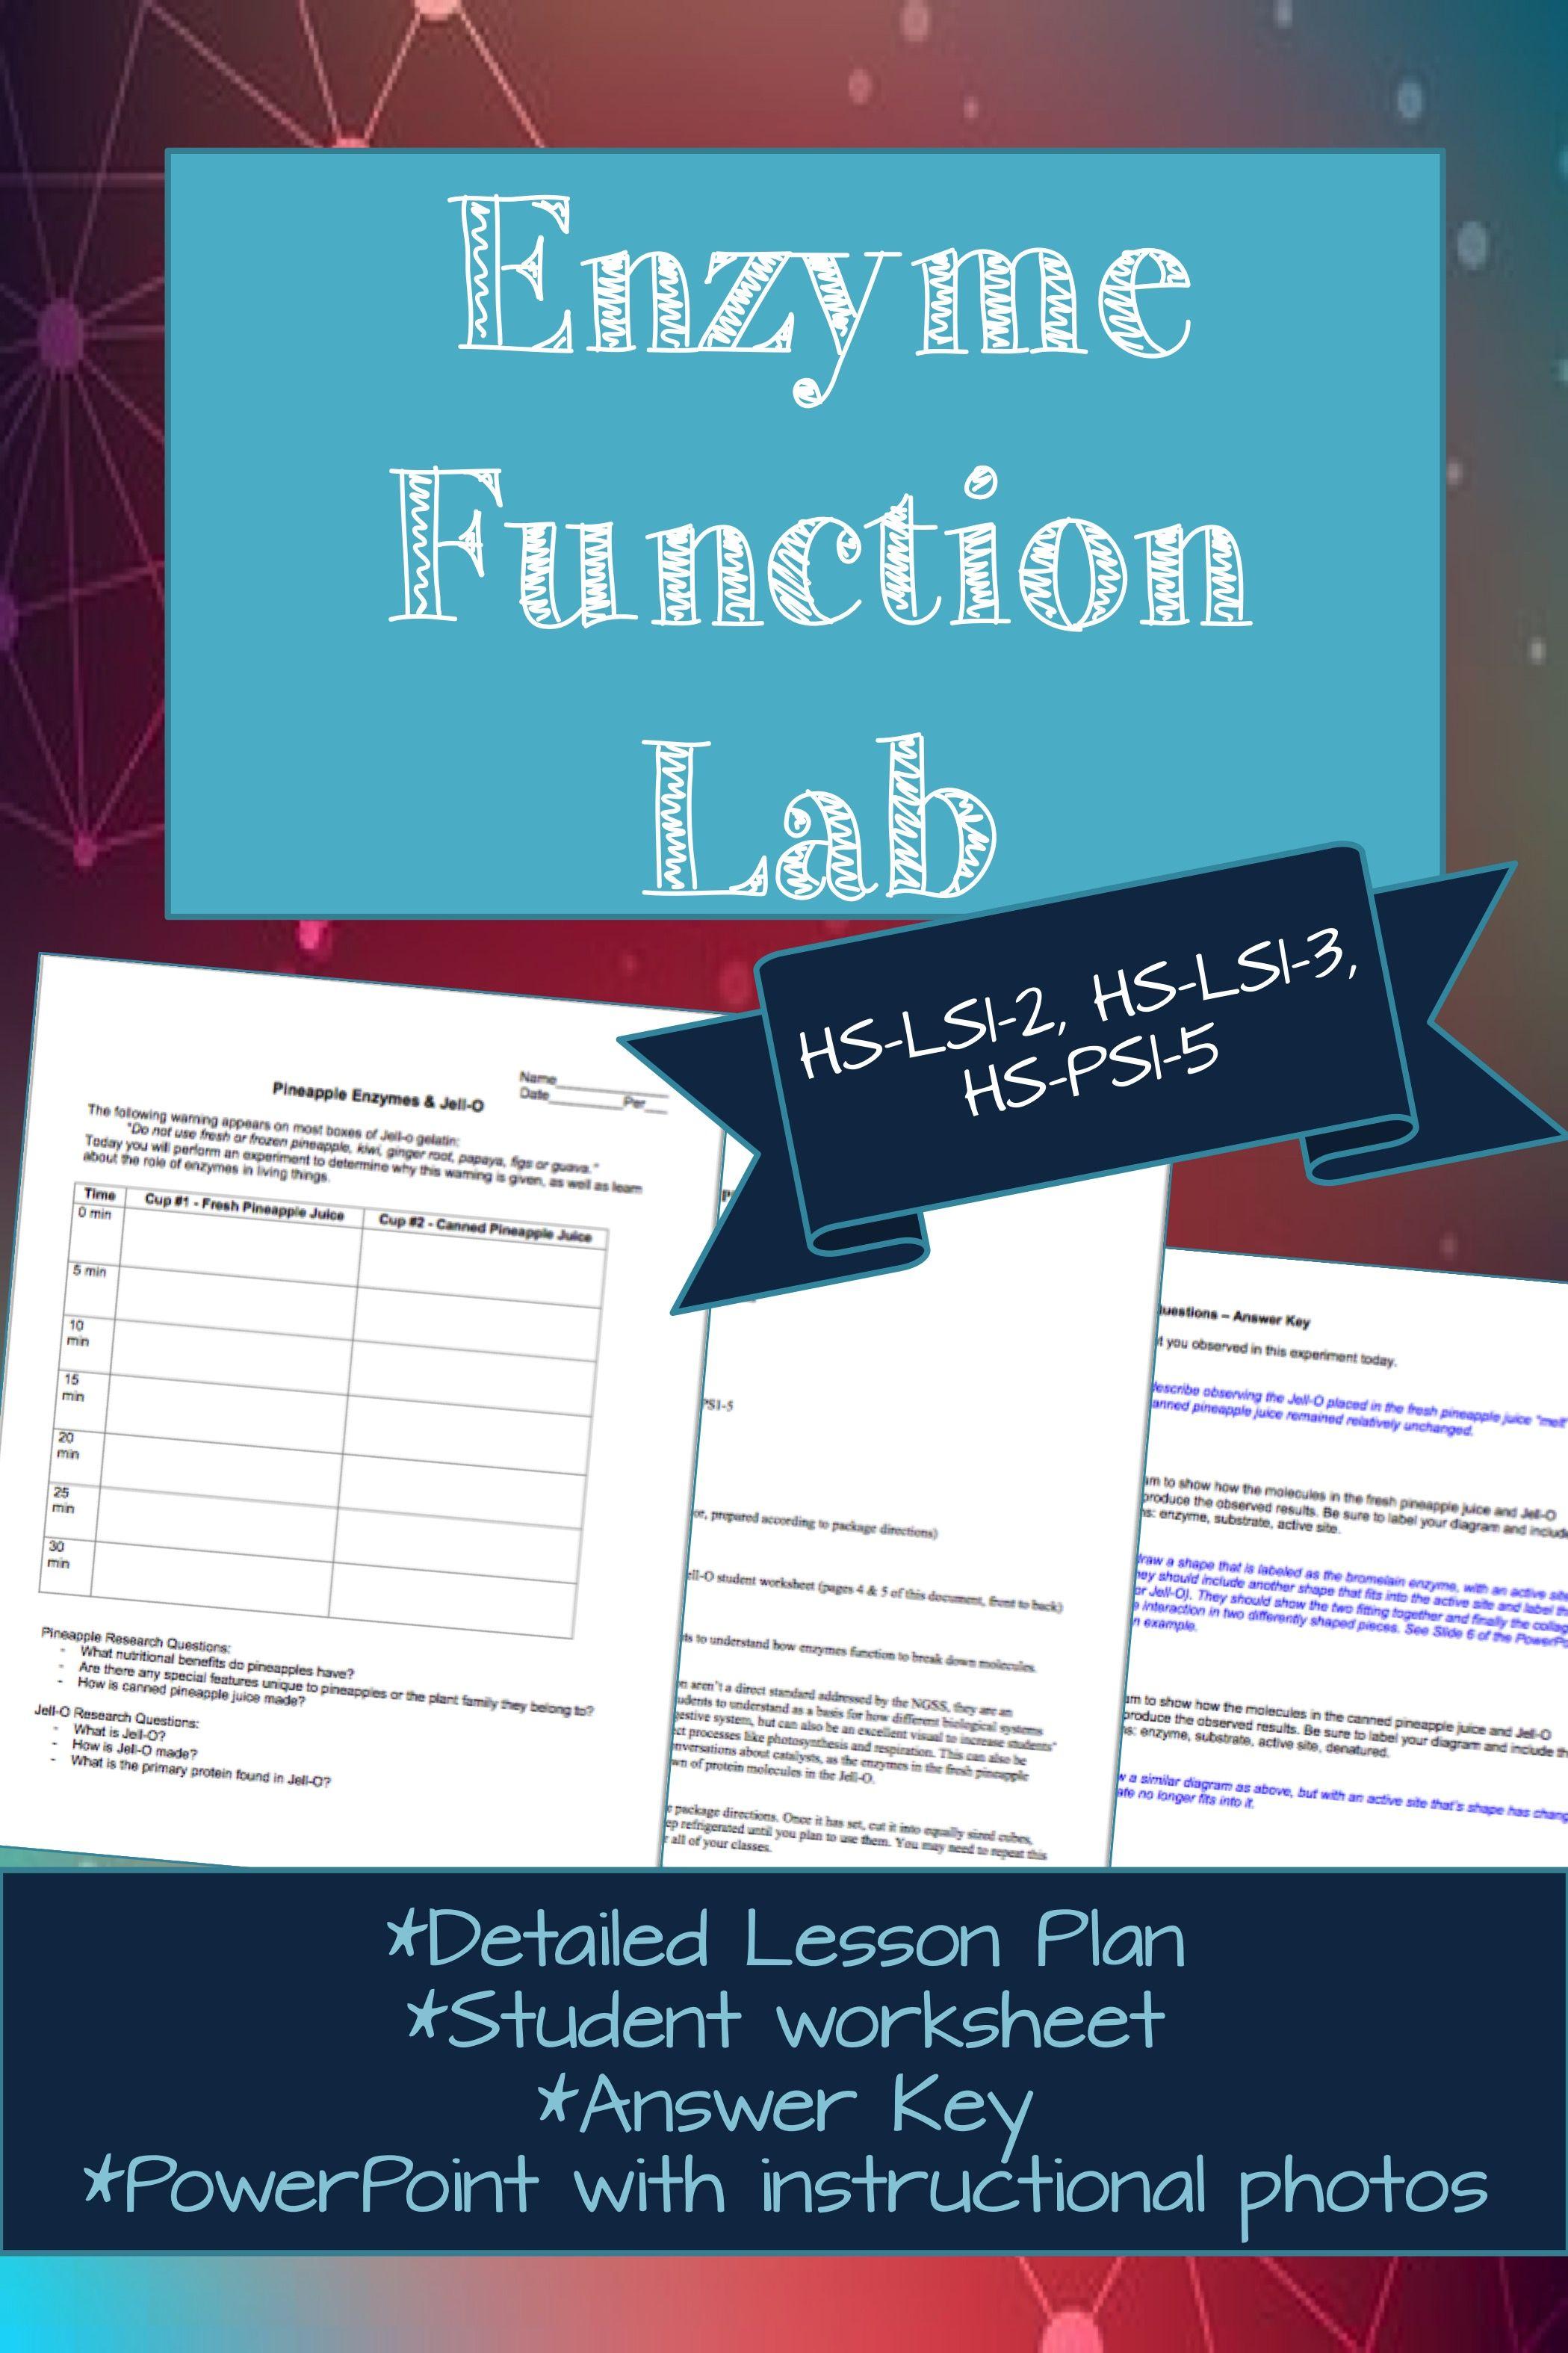 Simple Enzyme Function Lab Hs Ls1 2 Hs Ls1 3 Hs Ps1 5